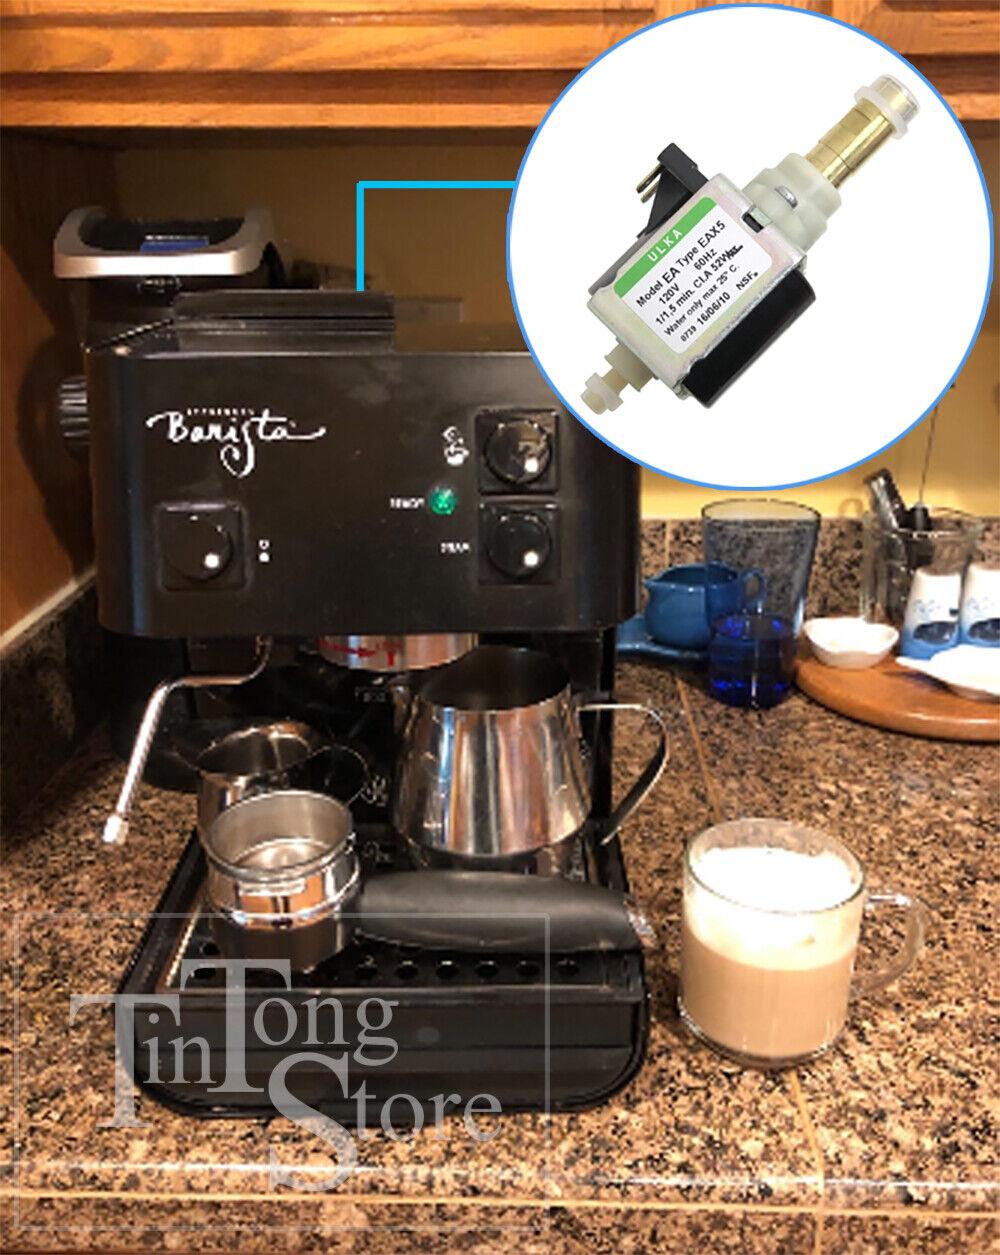 Pump Espresso Coffee Machine Breville BES840XL BES400XL Ranc